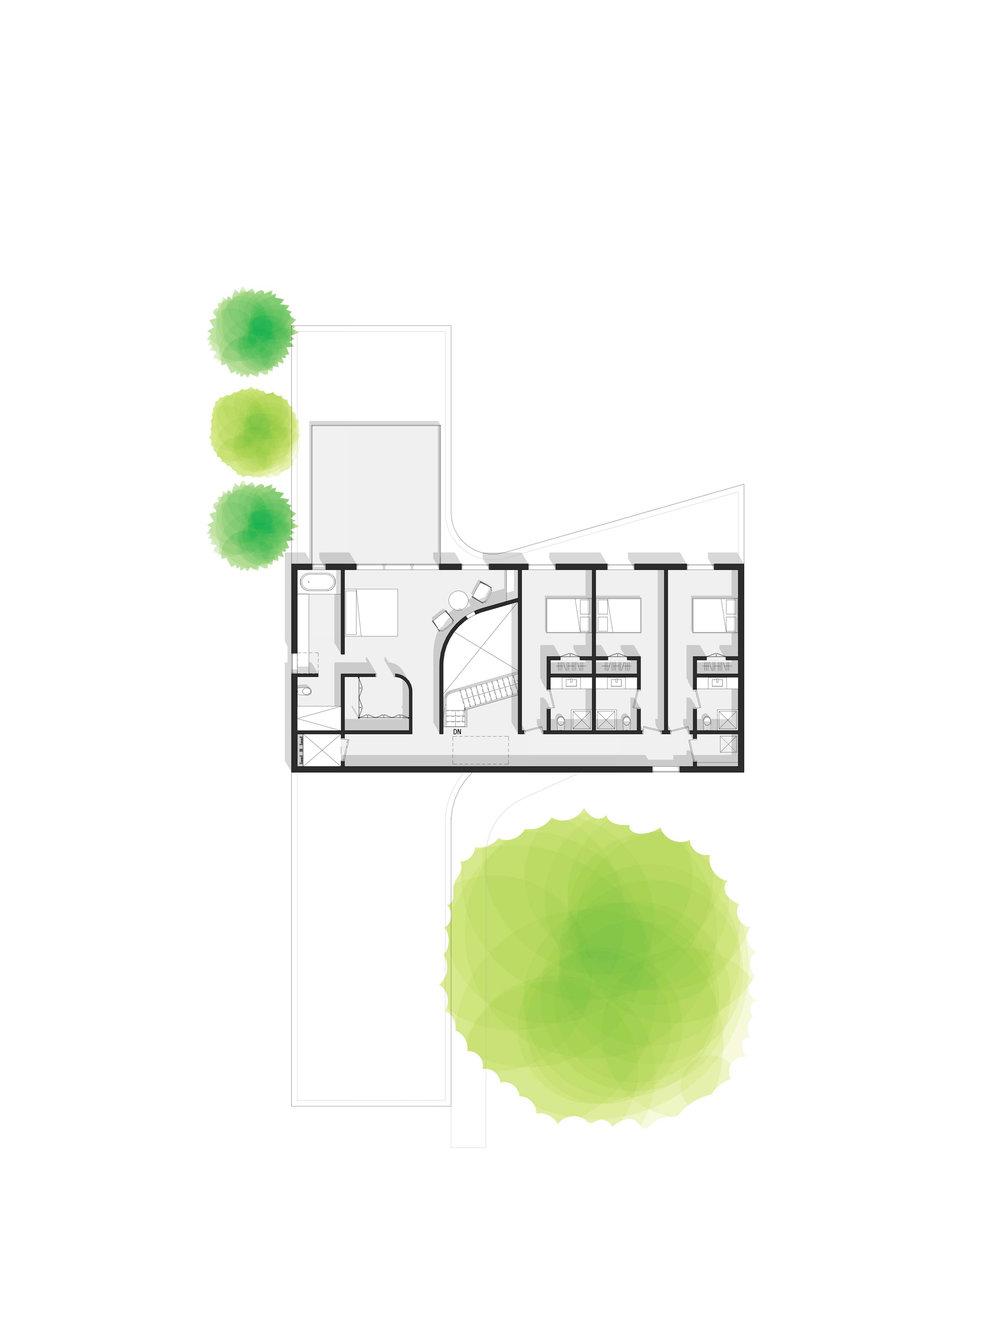 PLAN - LEVEL 2.jpg